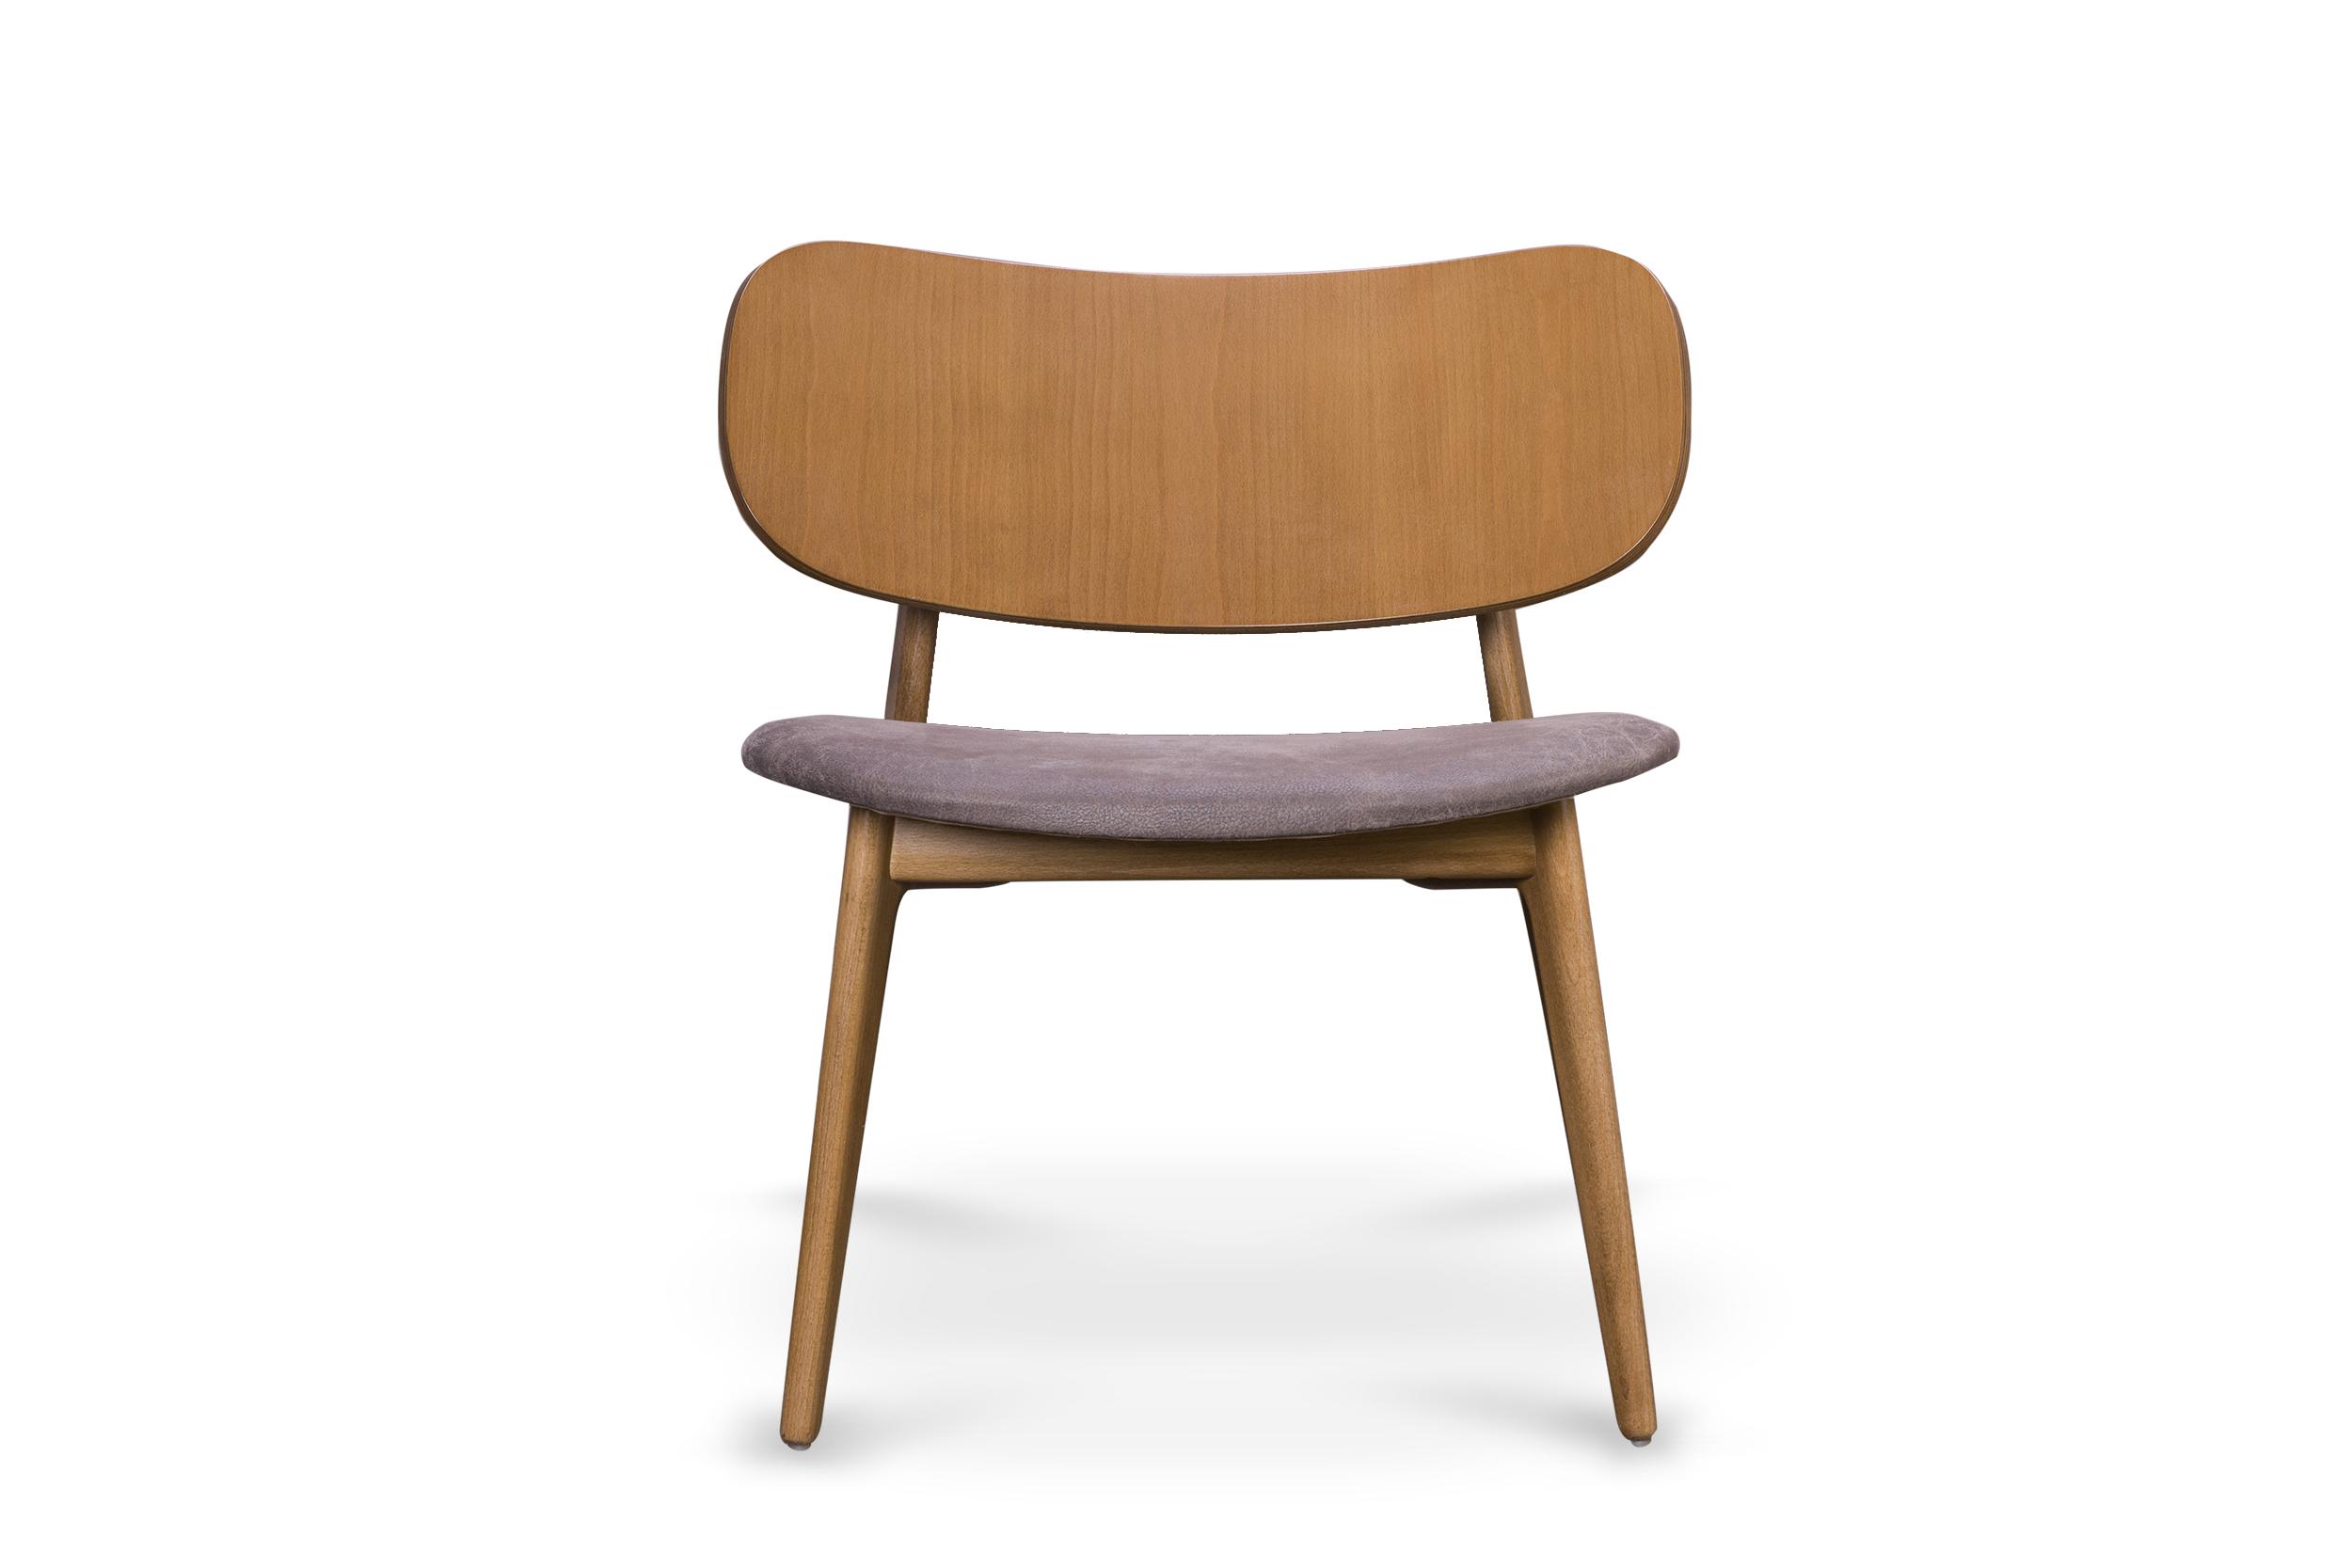 Кухонный стул MyFurnish 15433466 от thefurnish